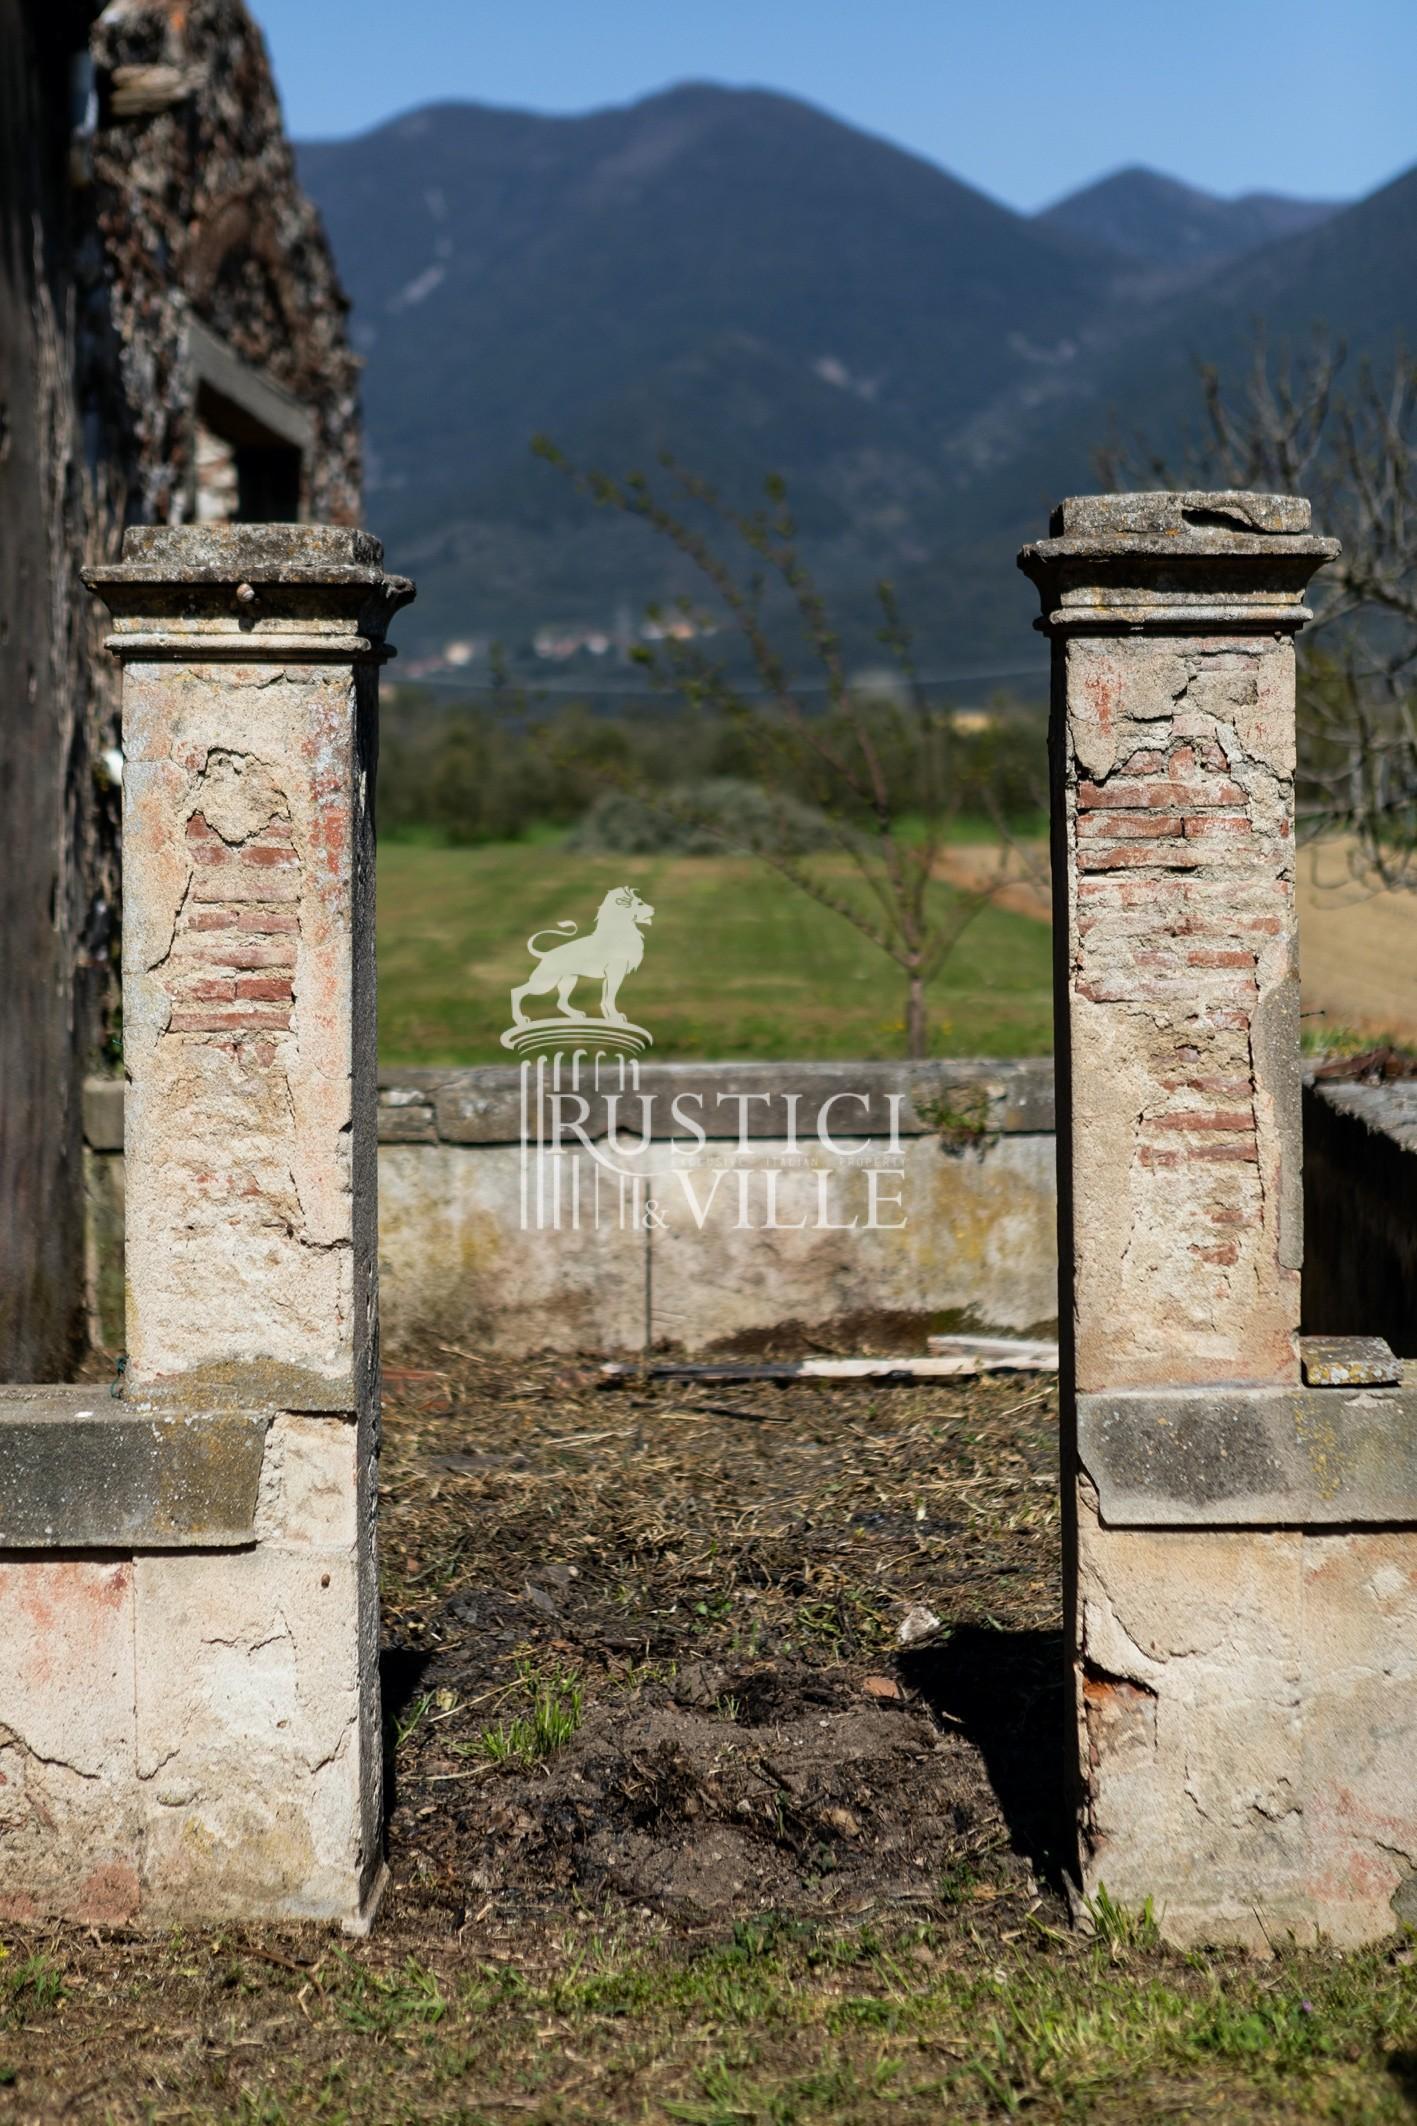 Historical building on sale to San Giuliano Terme (80/81)